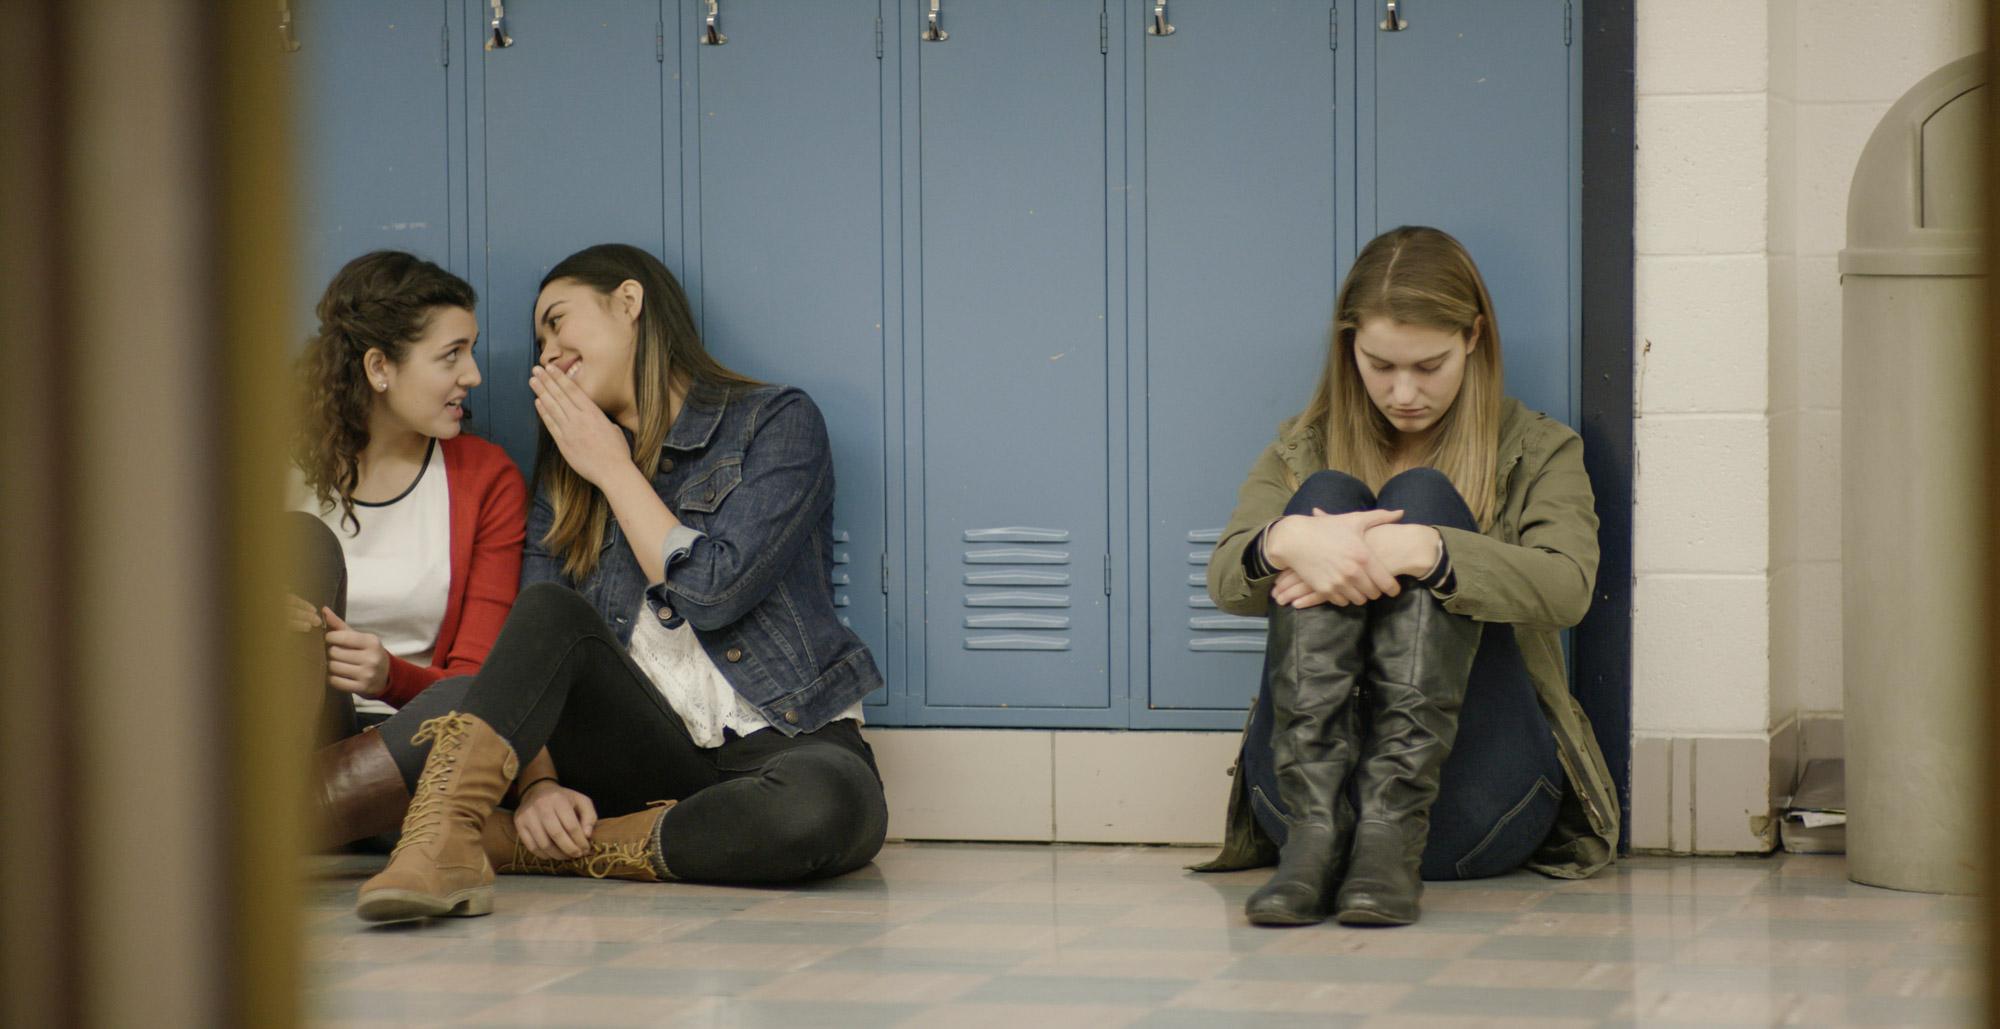 girls whispering at a locker